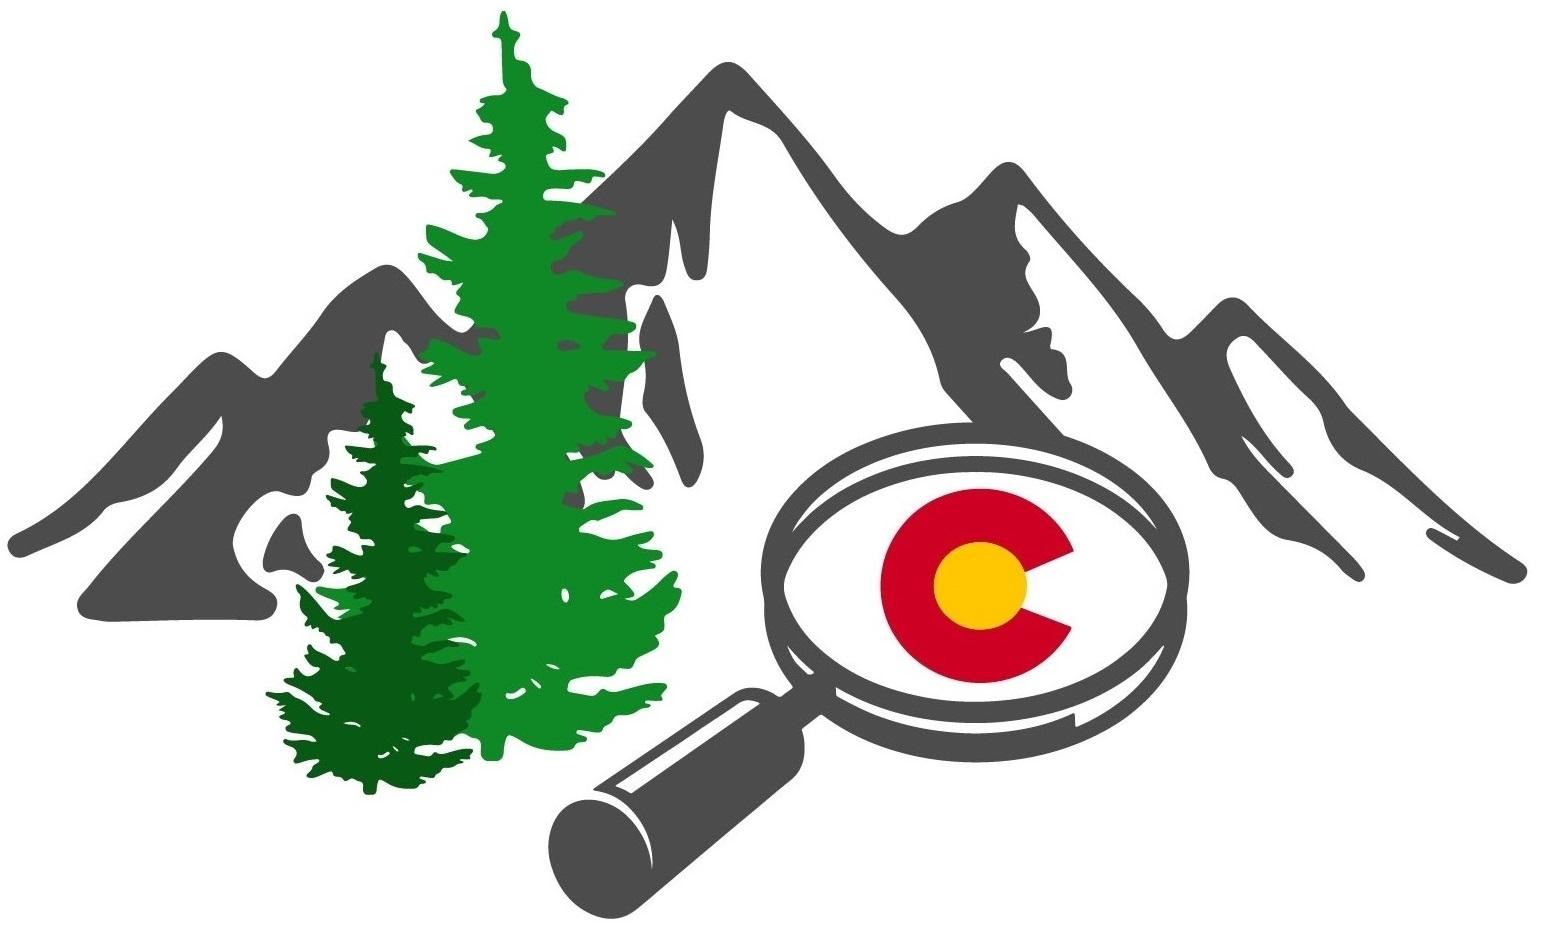 Colorado's Top Rated Local® Private Investigators Award Winner: Trailfinder, Inc.